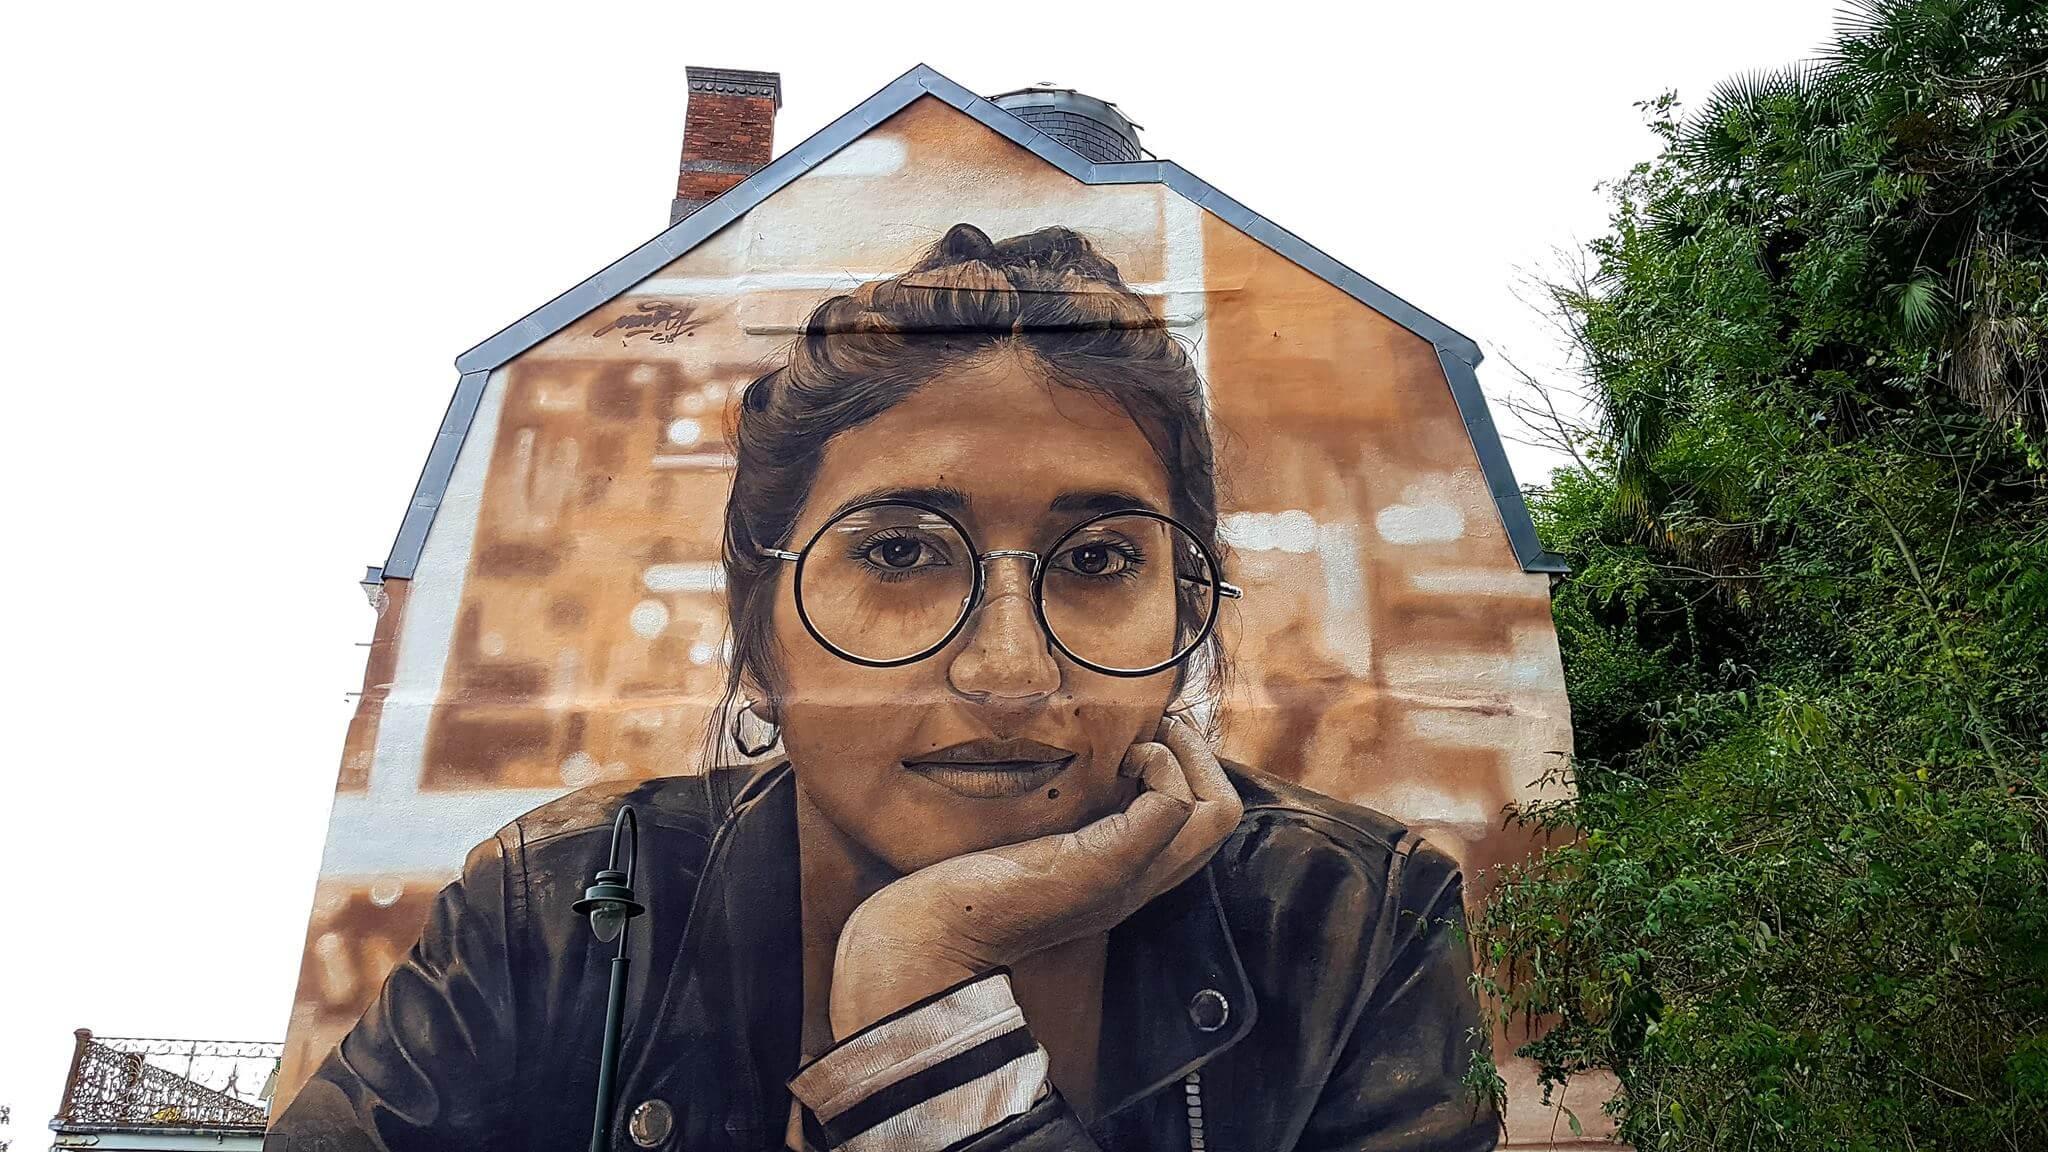 mantra-top-street-art-sa-femme-mural-2018.jpg